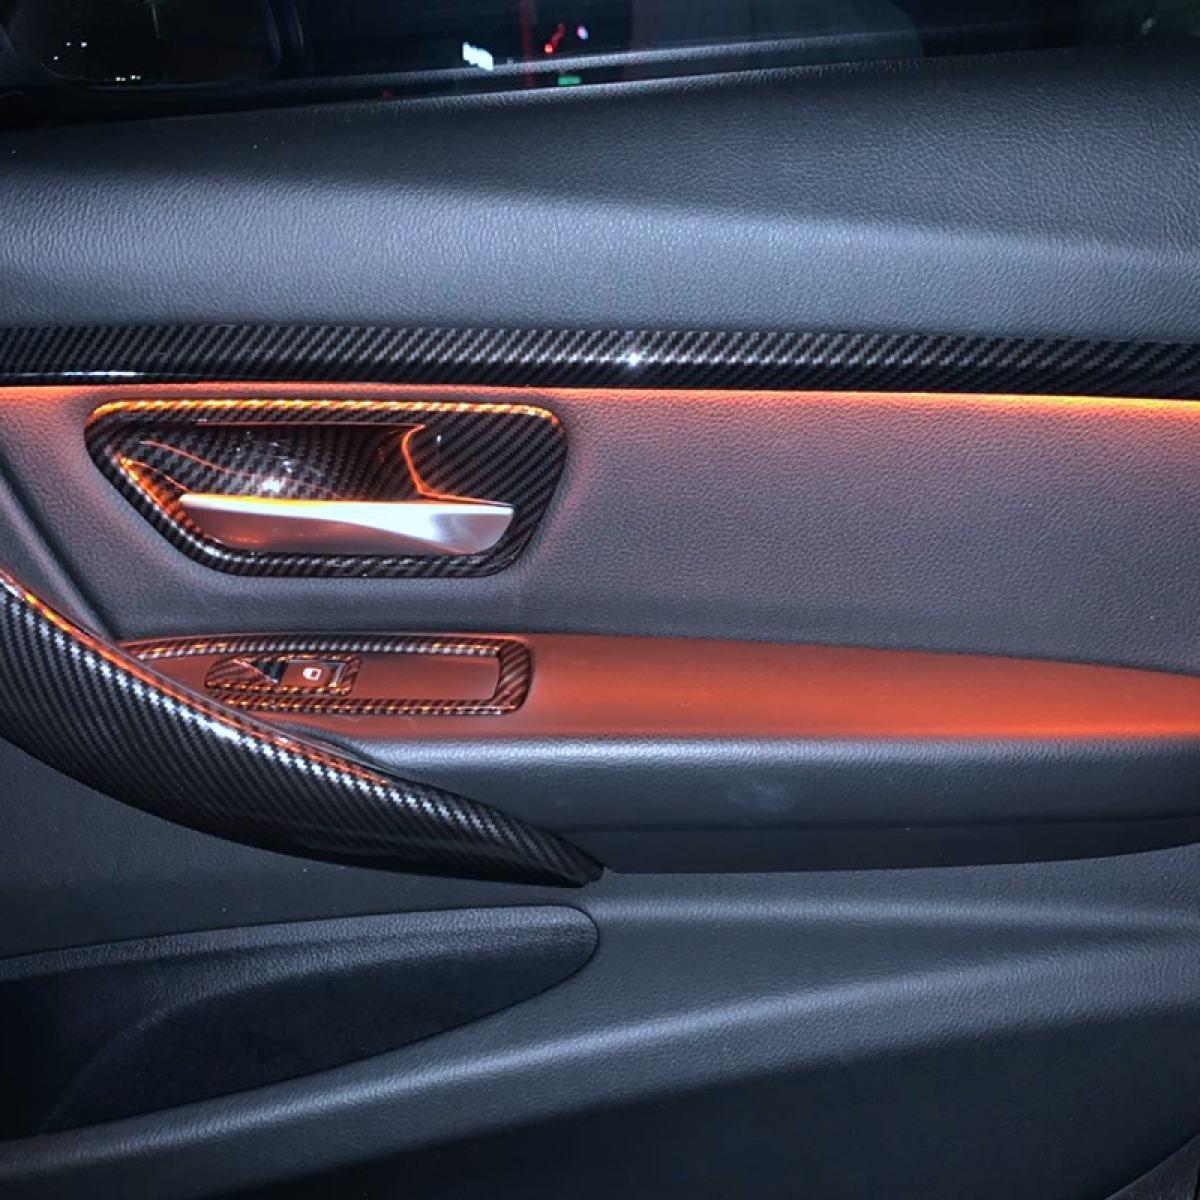 Carbon Look Interior Door Handle Cover Trim For Bmw 3 Series F30 F31 Gt F34 4 Series F36 Lazada